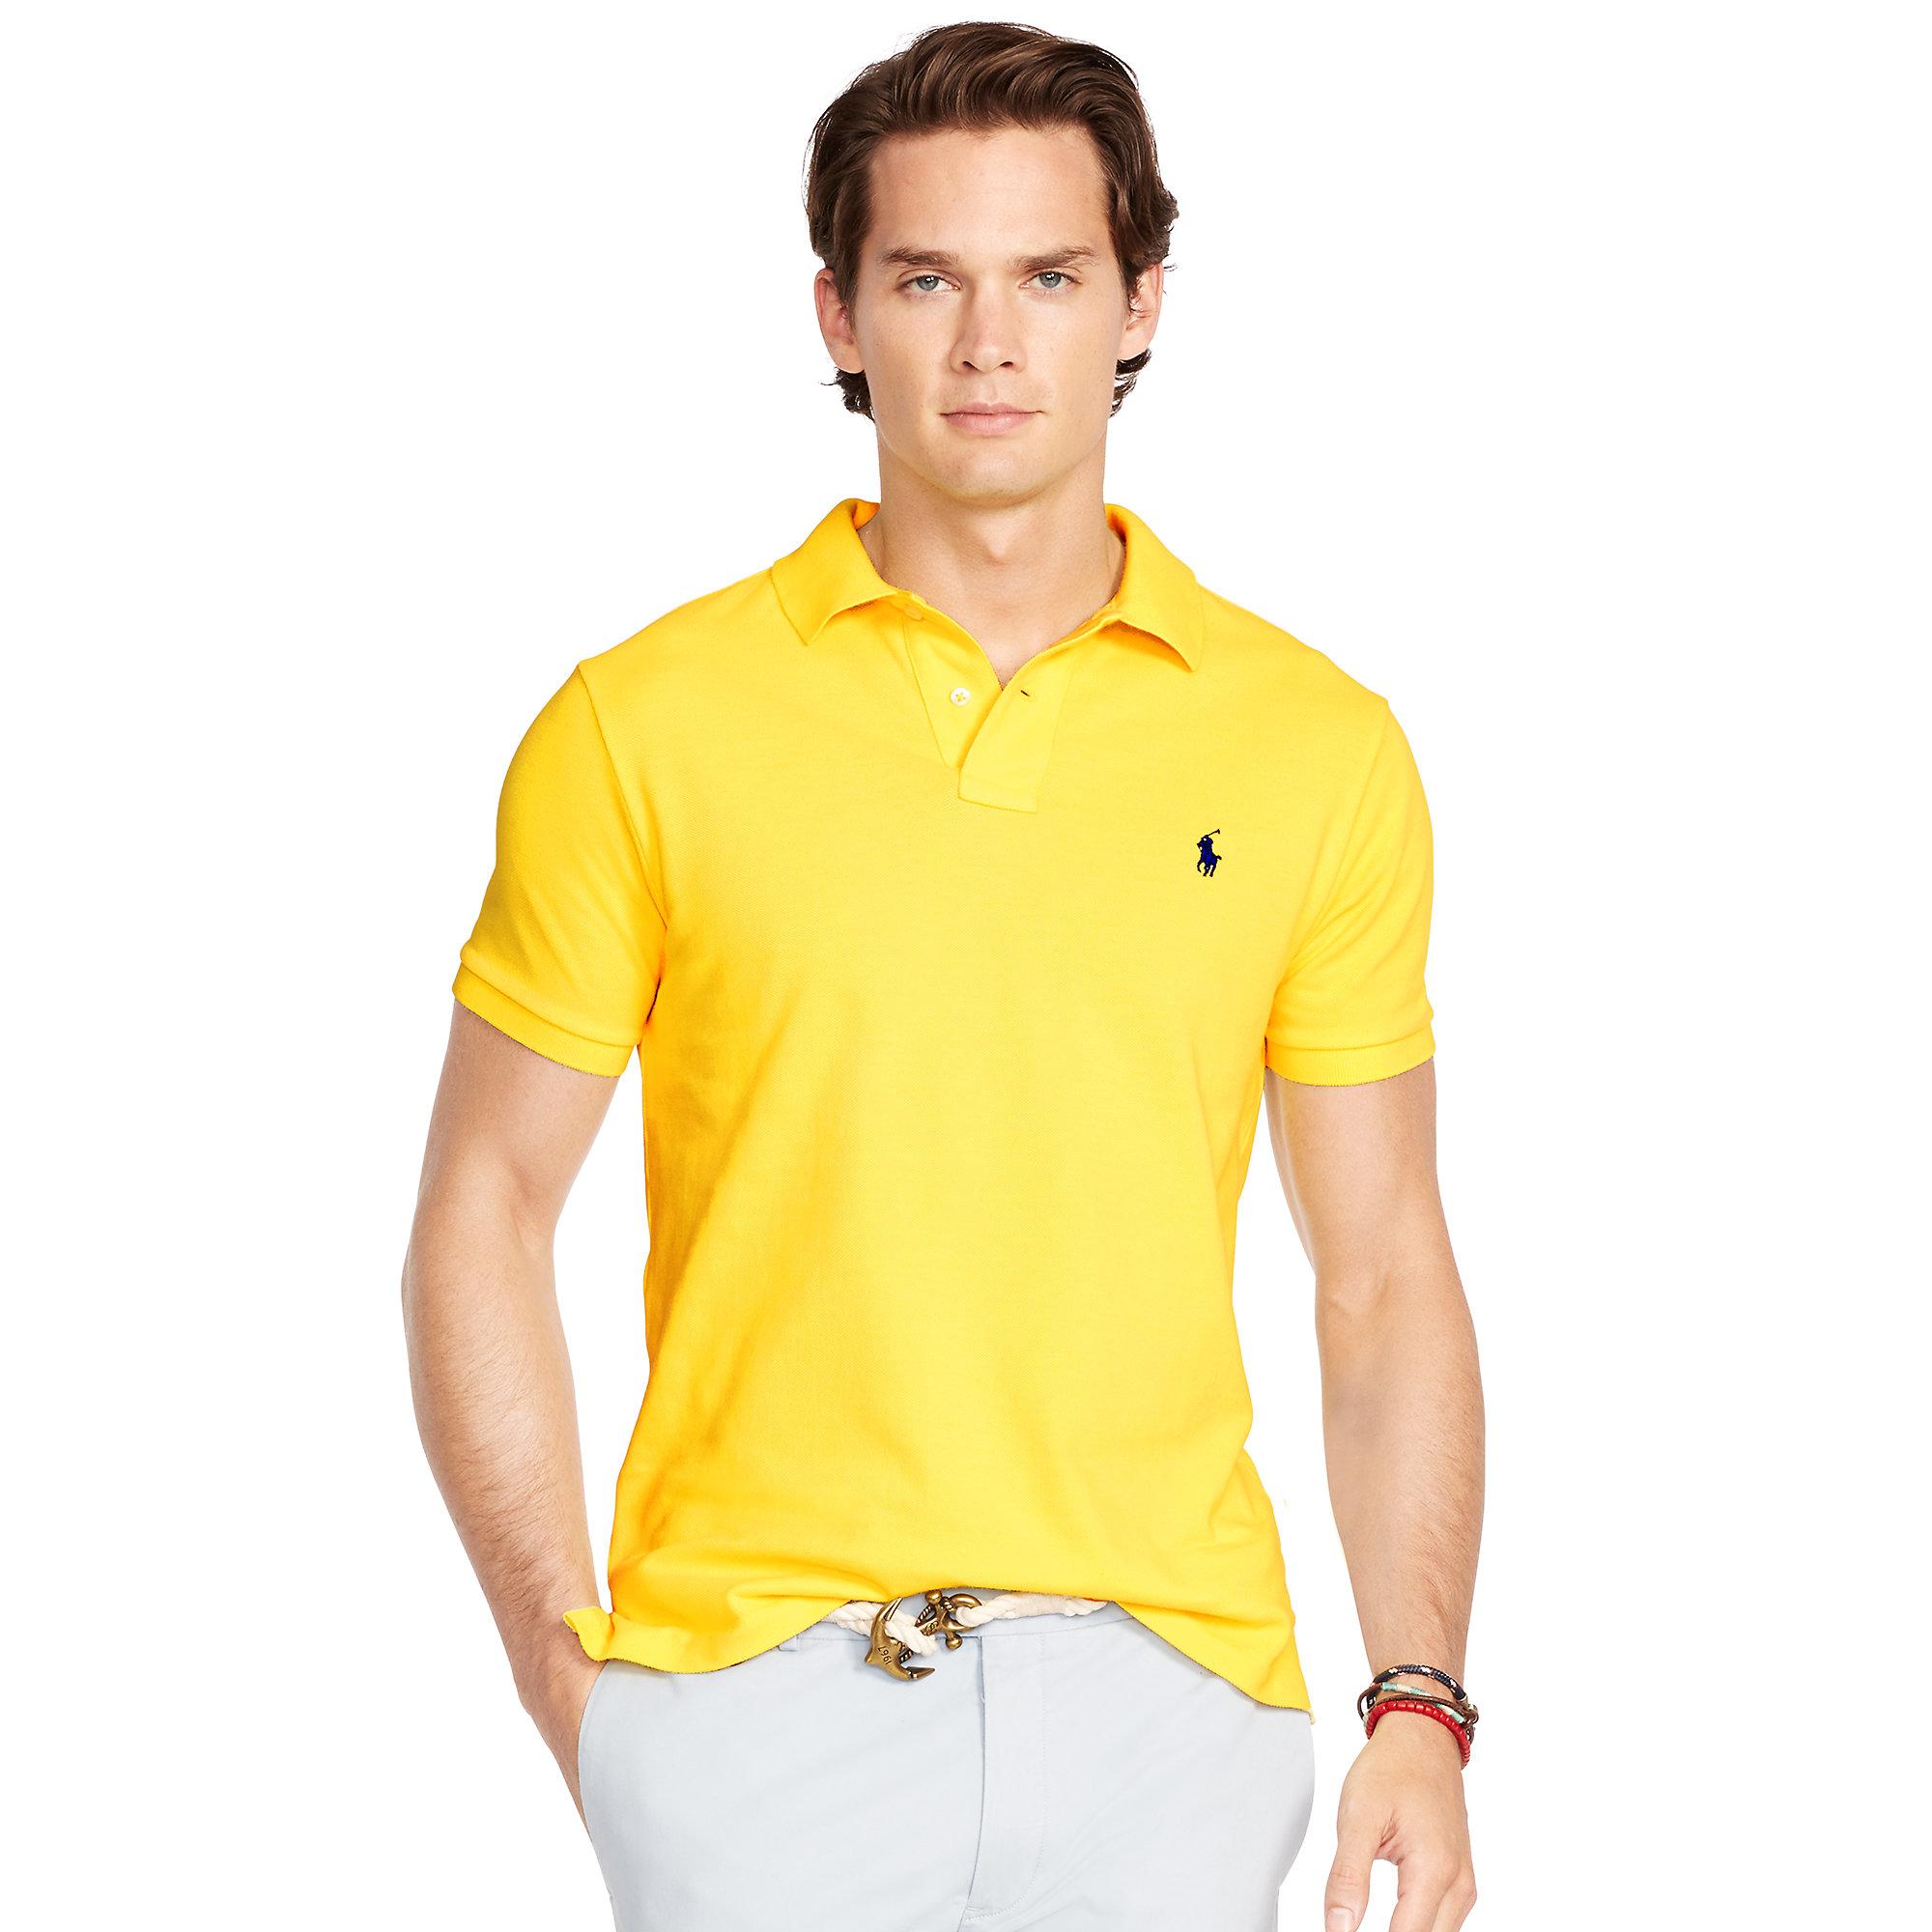 Mens Tailored Fit Short Sleeve Original Mesh Polo Shirt Bcd Tofu House